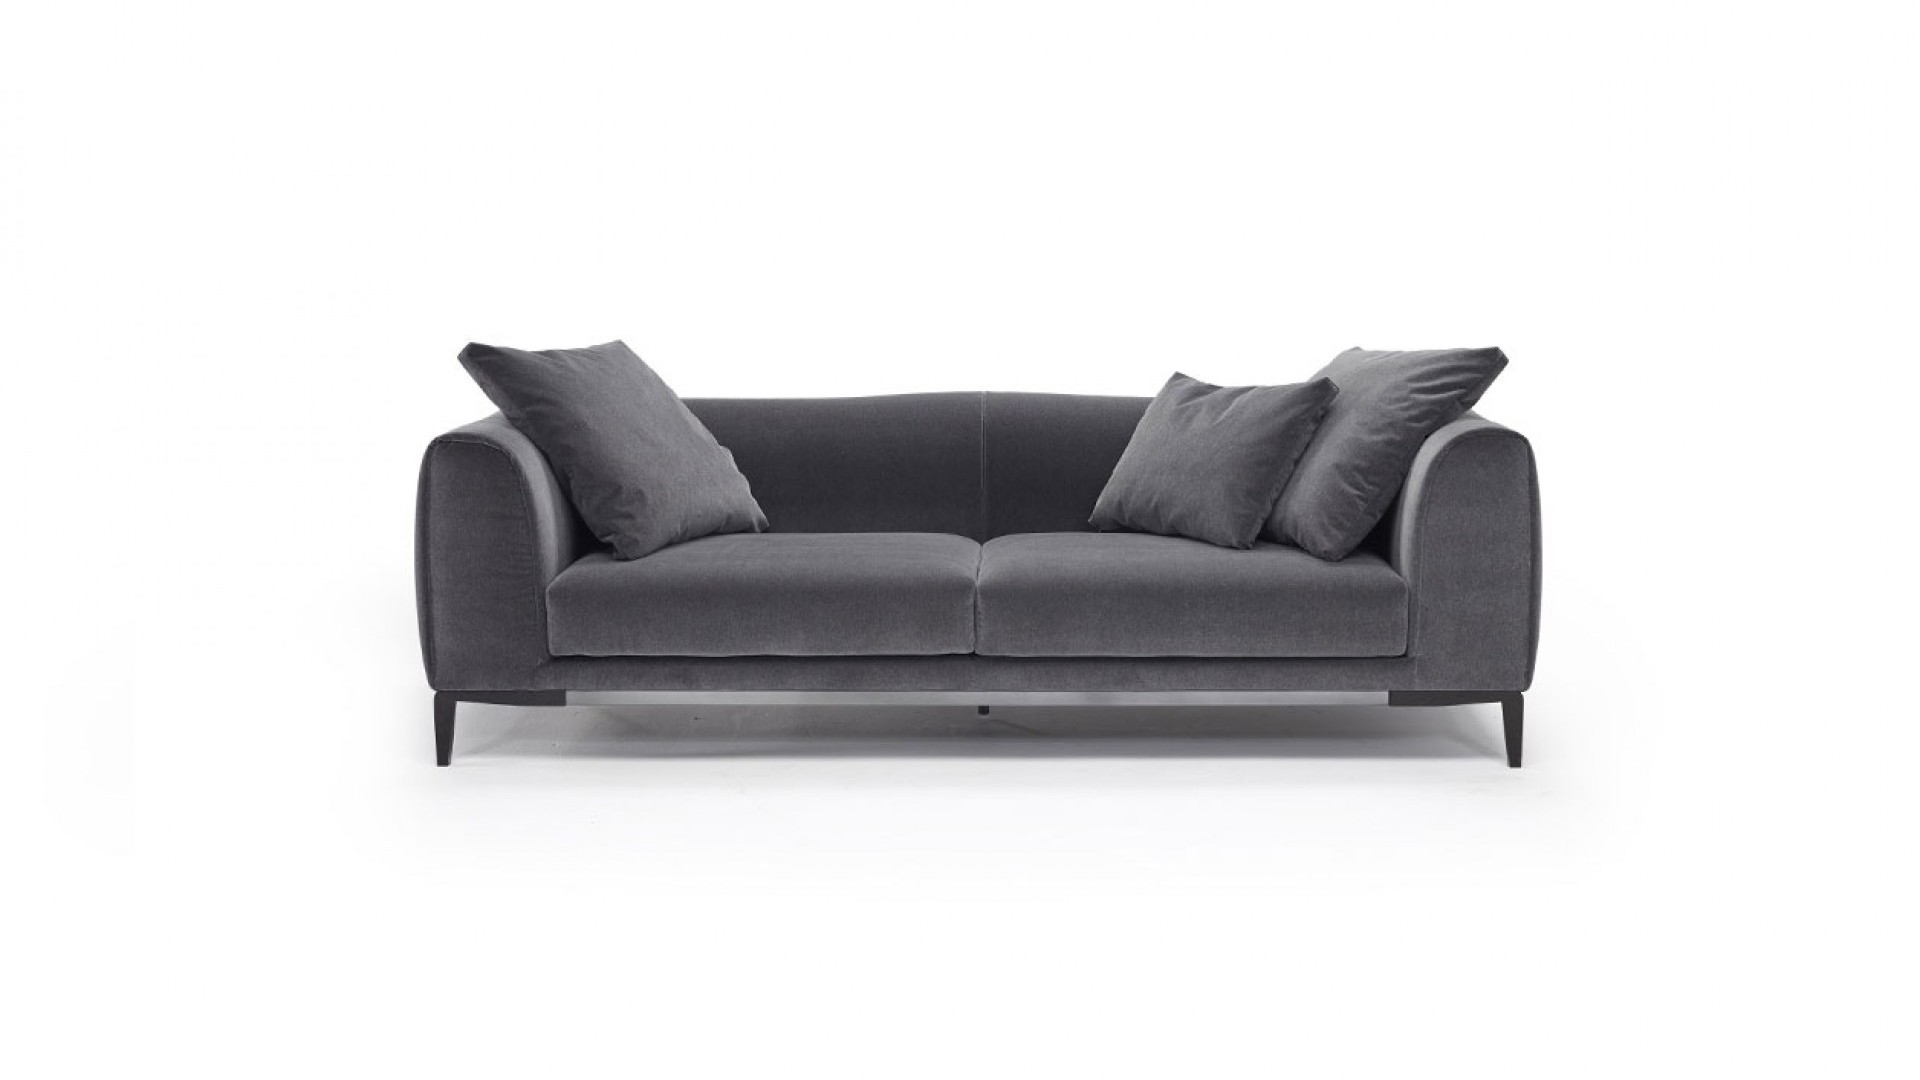 Natuzzi Microfiber Sofa Engrossing